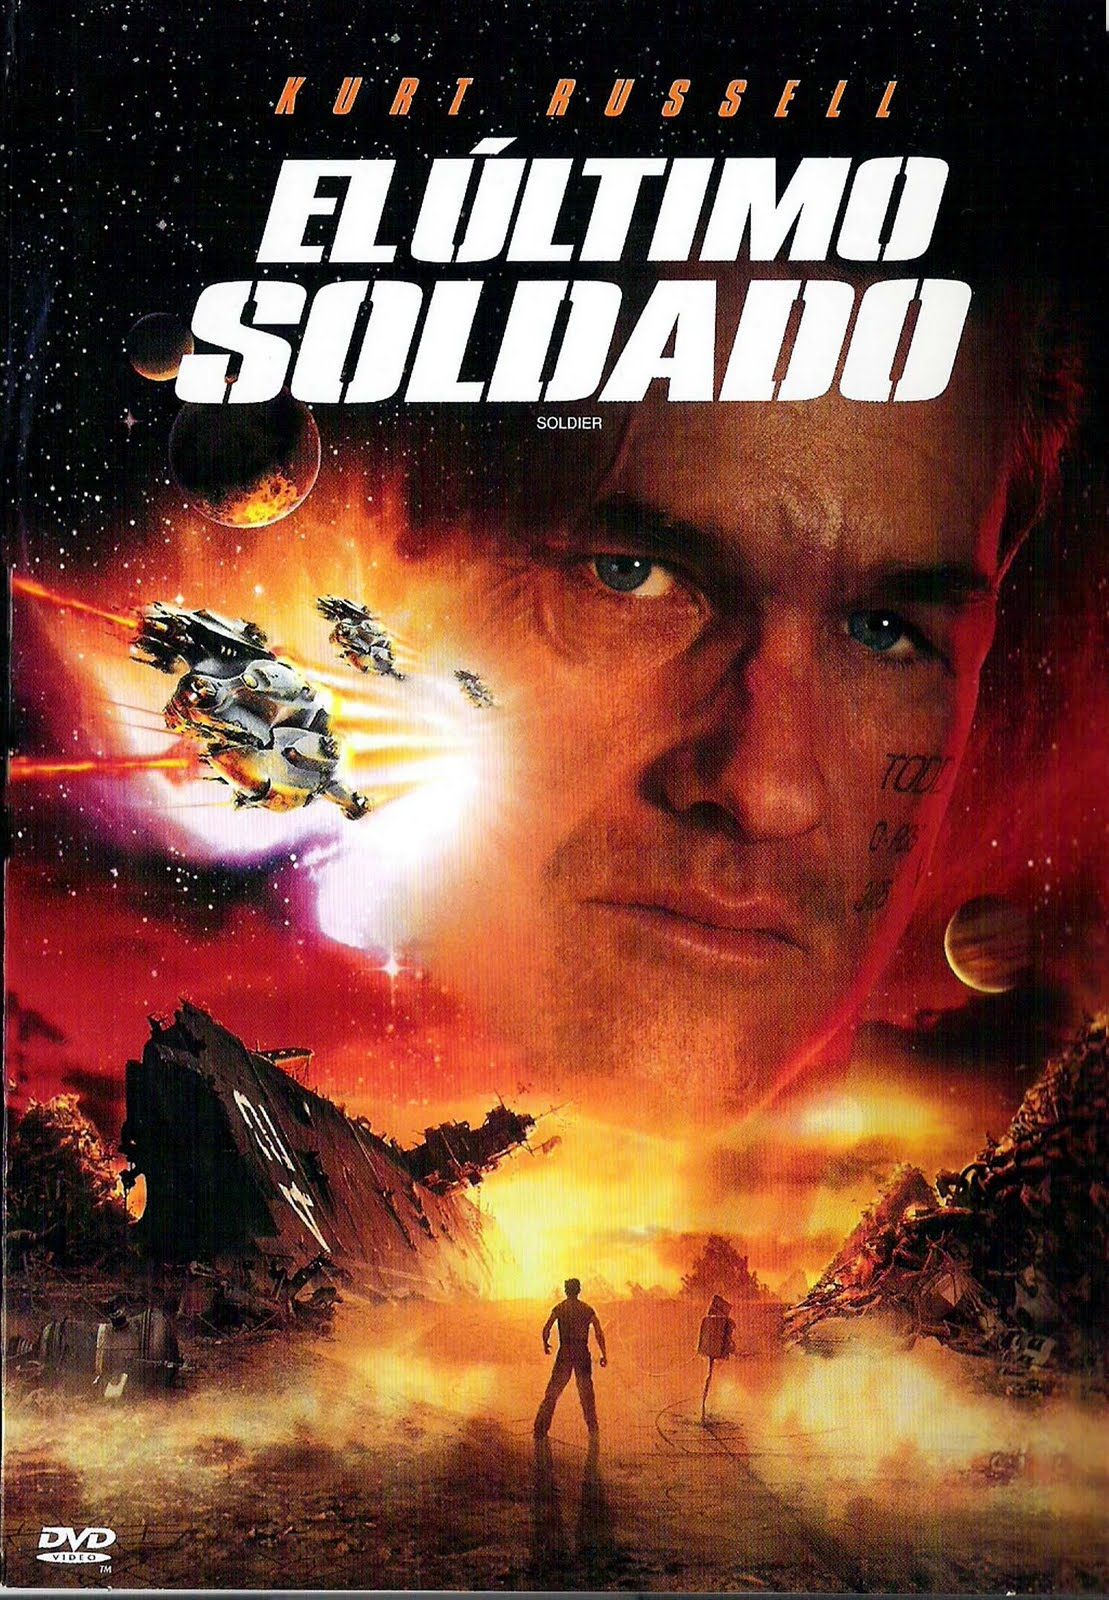 http://1.bp.blogspot.com/_Or369nWS8Hc/TJU1oG3lVaI/AAAAAAAAAk8/vDF_E0-Xvjo/s1600/soldier+1998+++Paul+Anderson++DVD+ARGENTINA.jpg